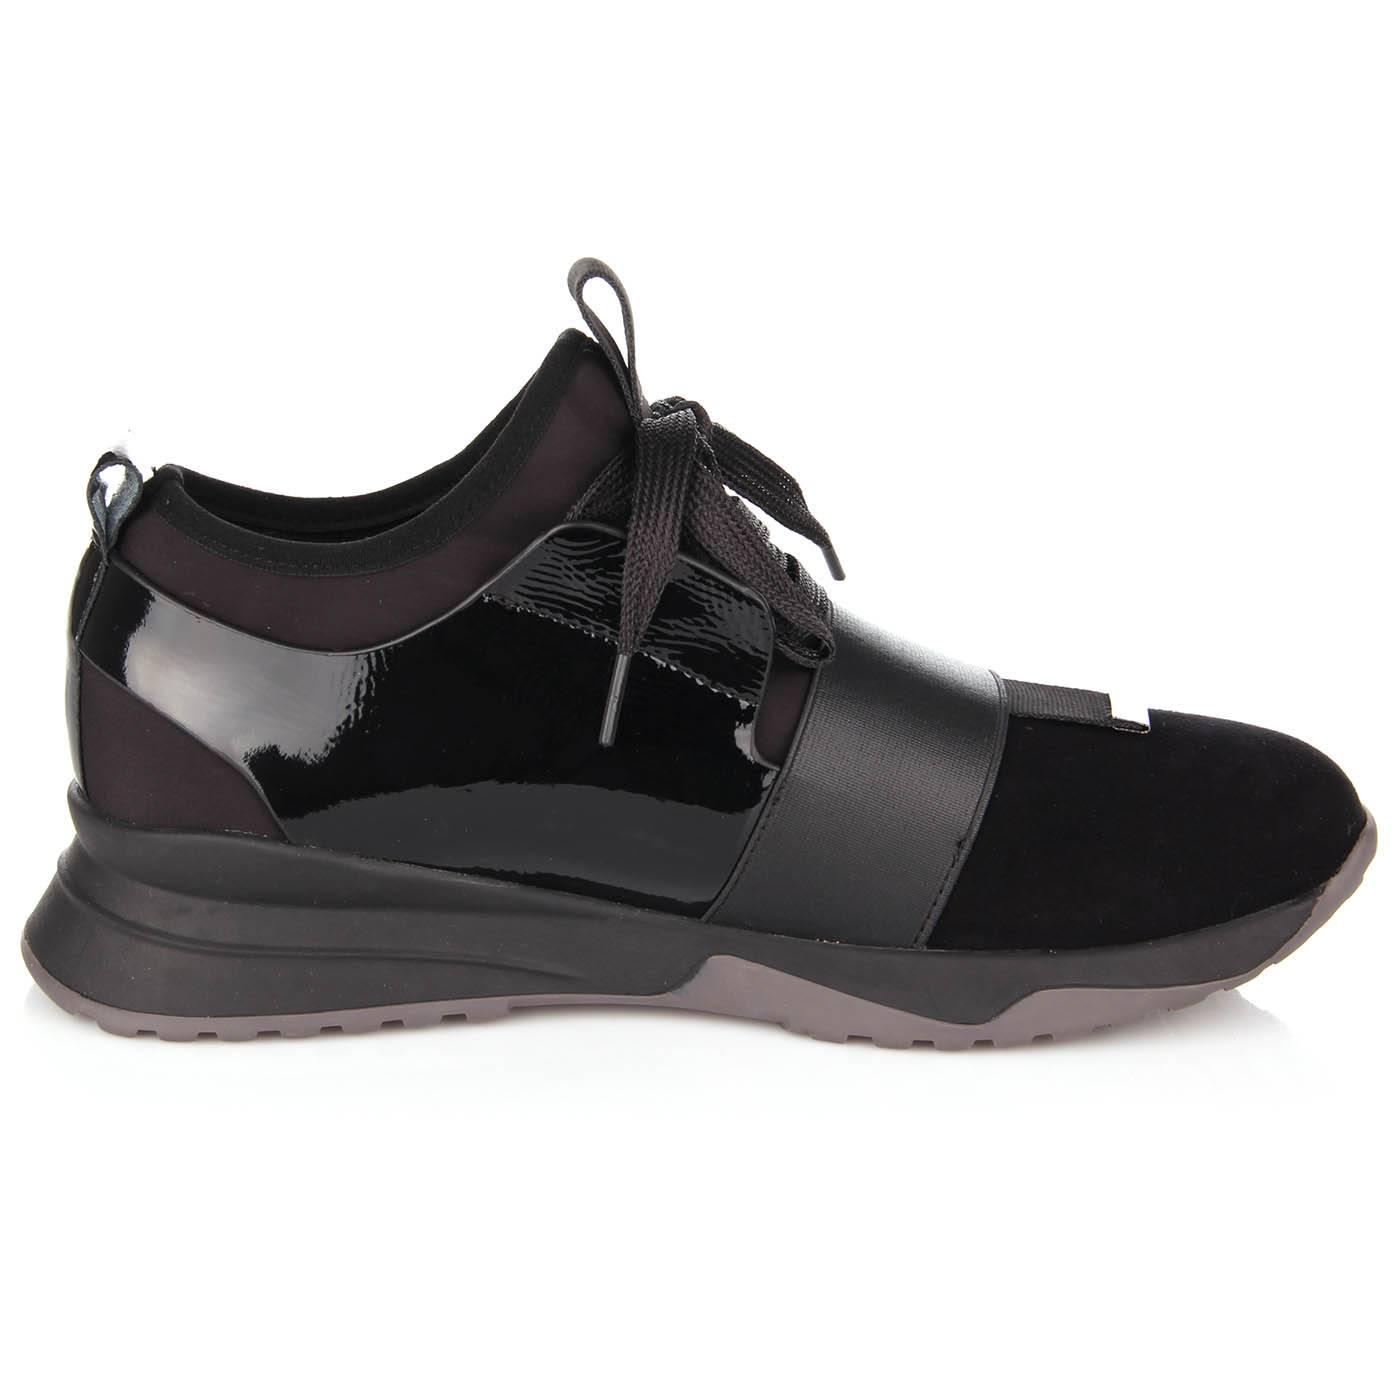 Кросівки жіночі ditto 6926 Чорний купить по выгодной цене в интернет ... 810b9a150aa1f